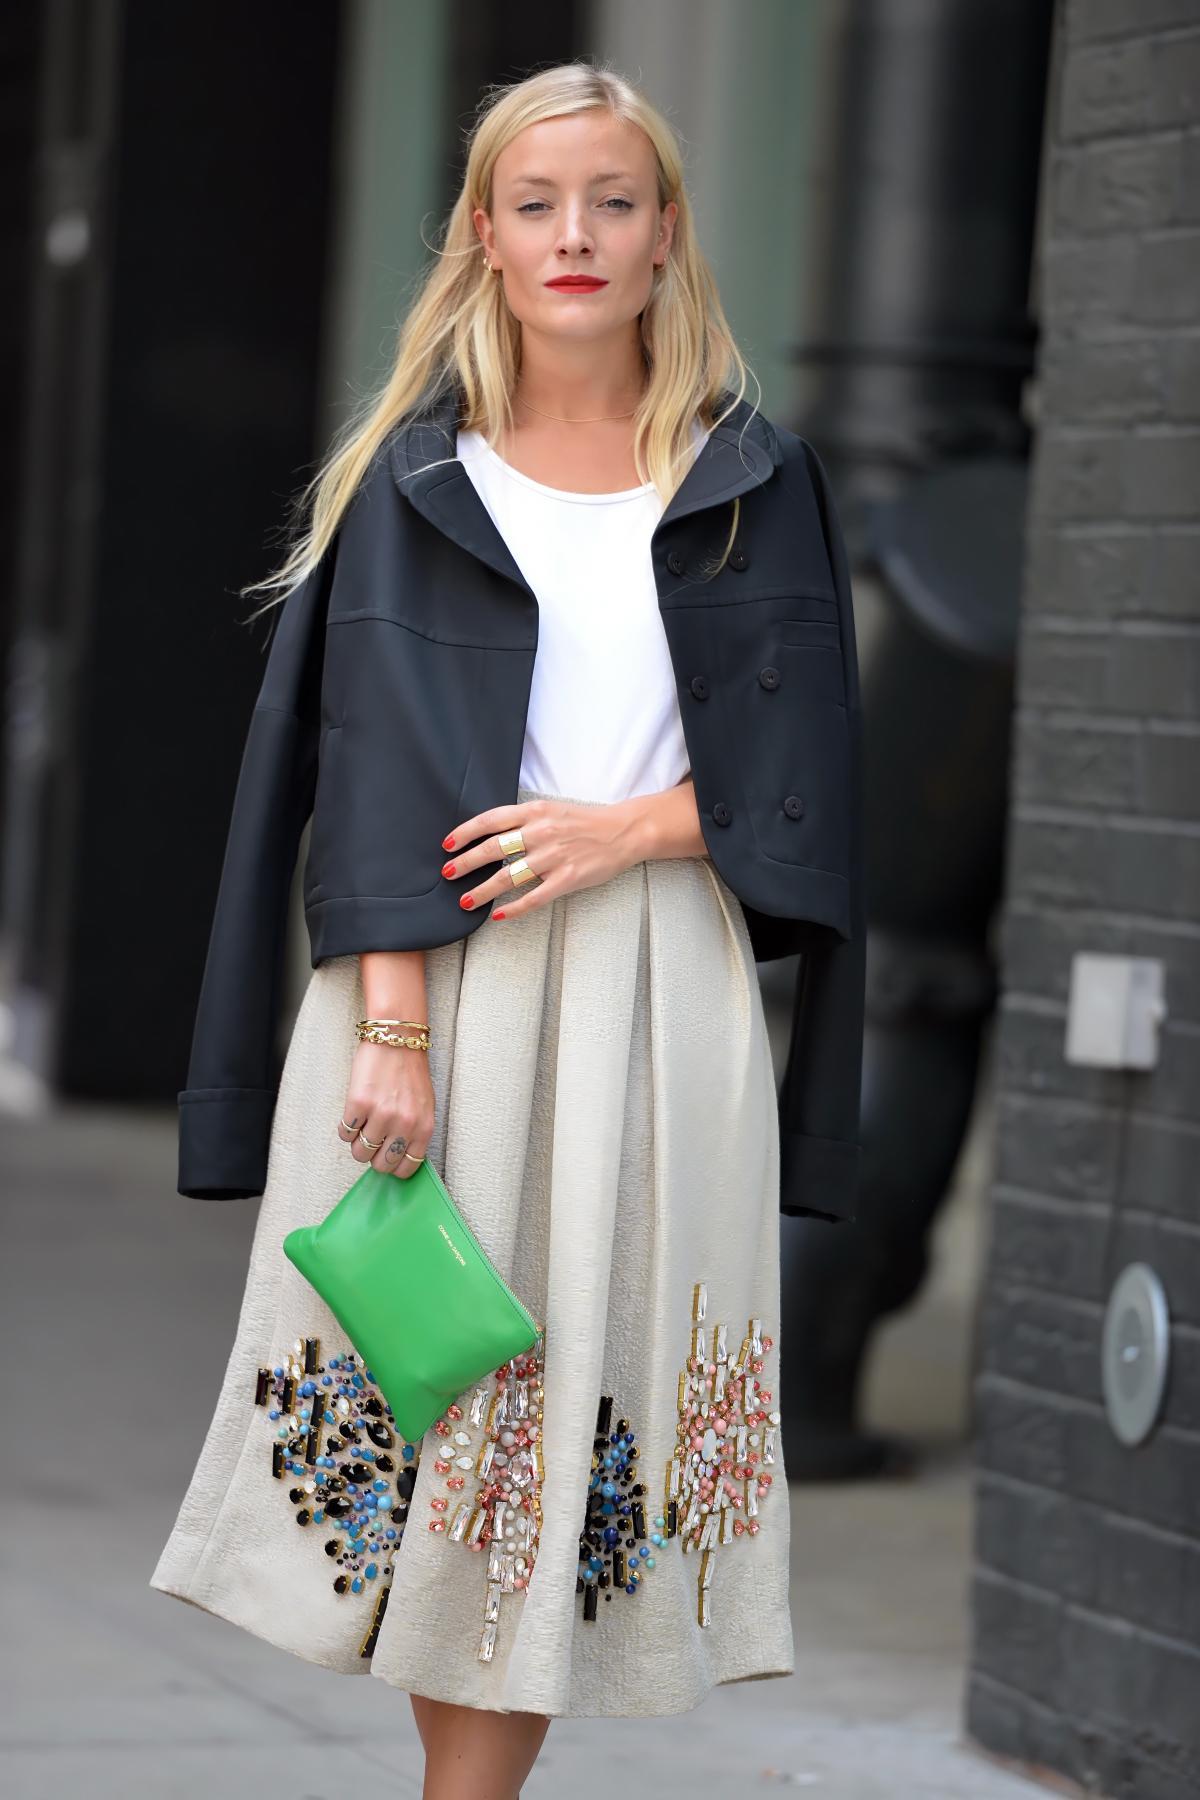 Nina Garcia s Best Style Tips - How to Dress Like a Fashion Editor 43